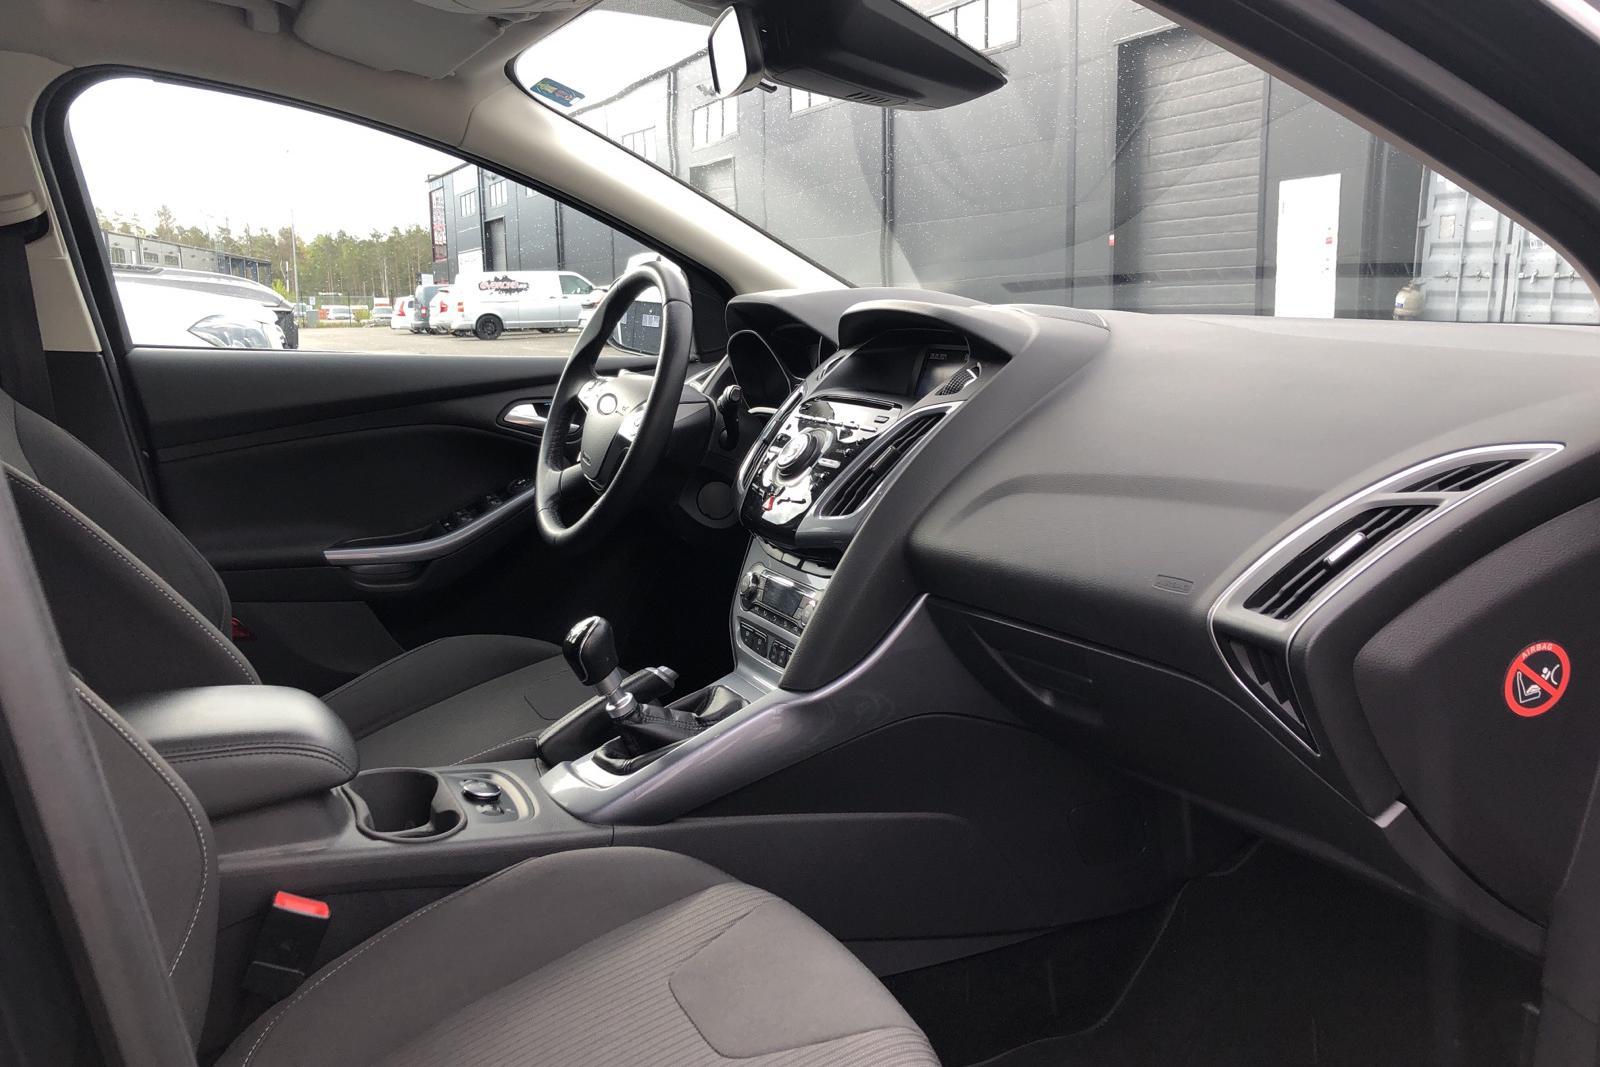 Ford Focus 1.6 EcoBoost Kombi (182hk) - 12 735 mil - Manuell - svart - 2013